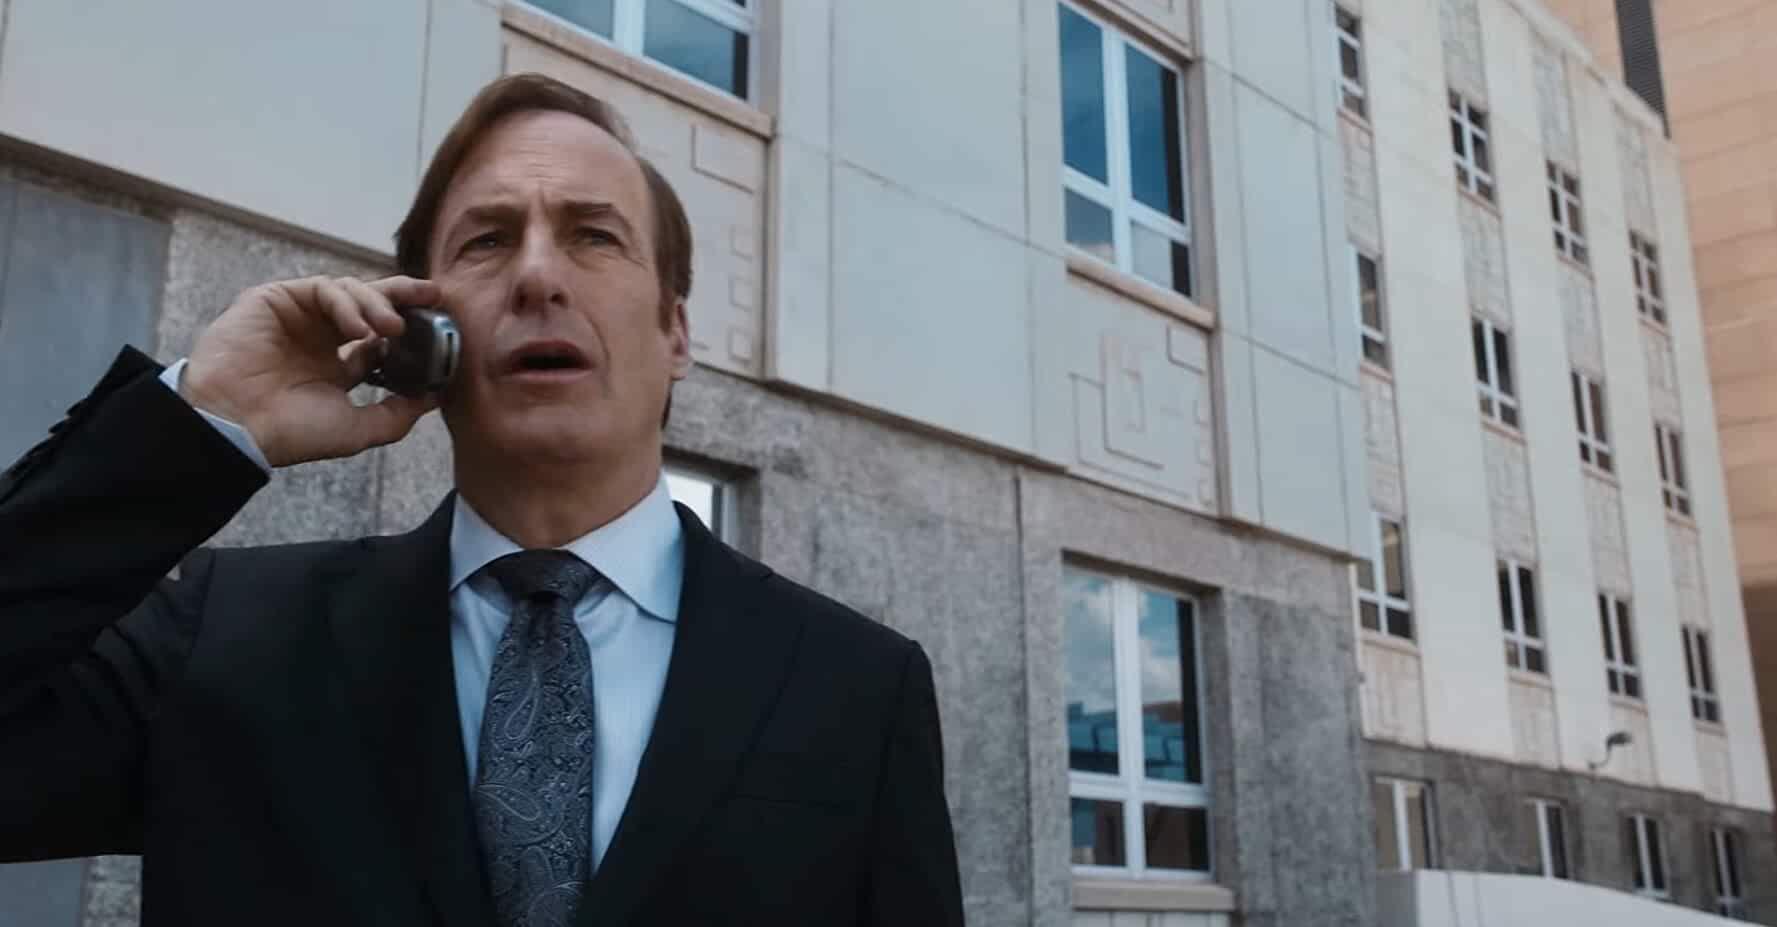 Better Call Saul Season 5 Episode 7